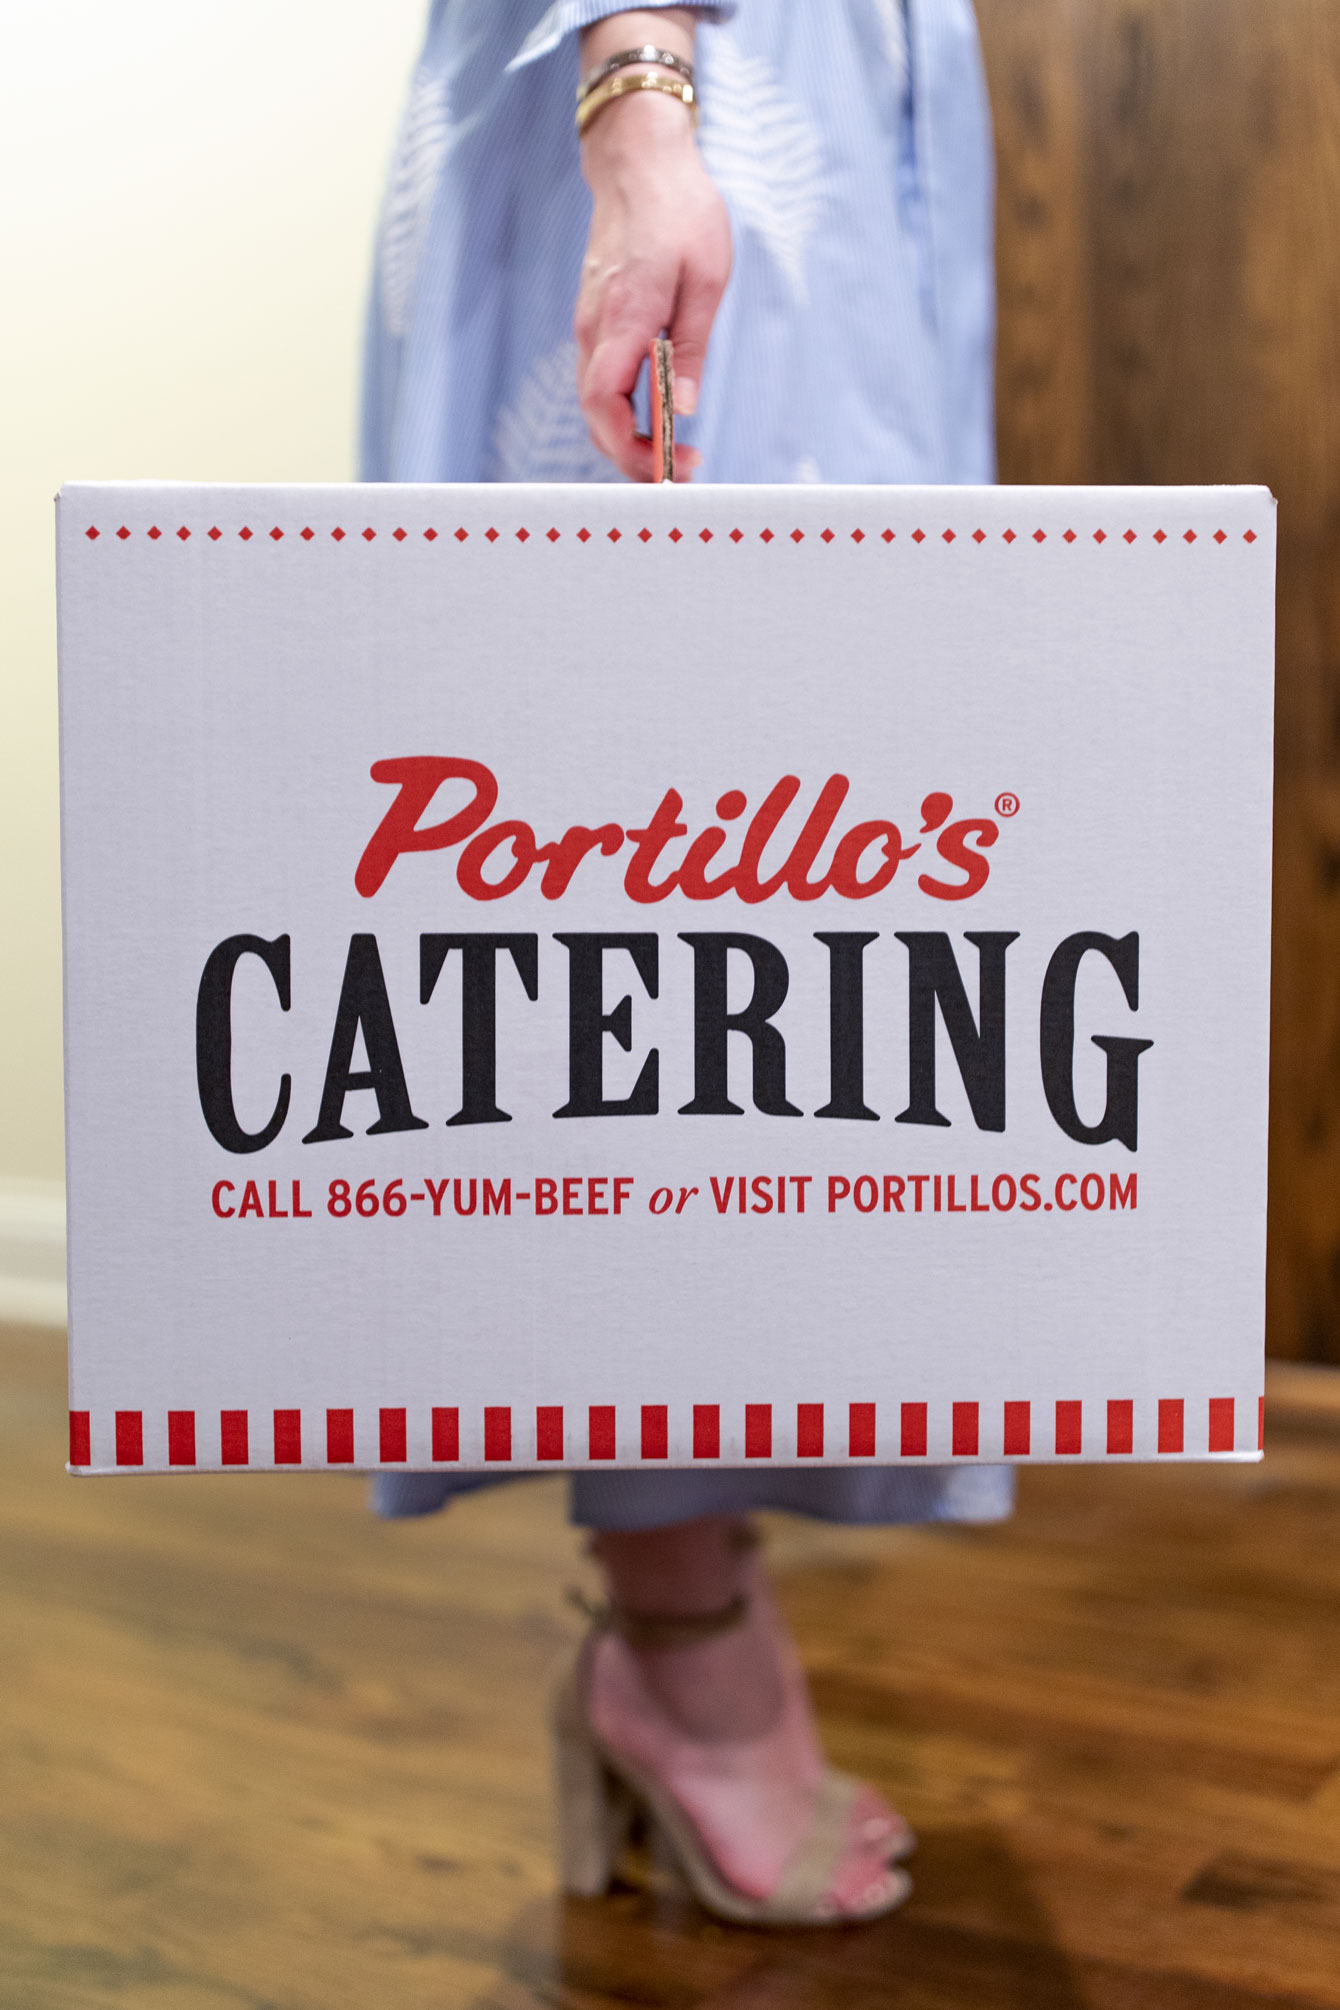 Portillos Catering